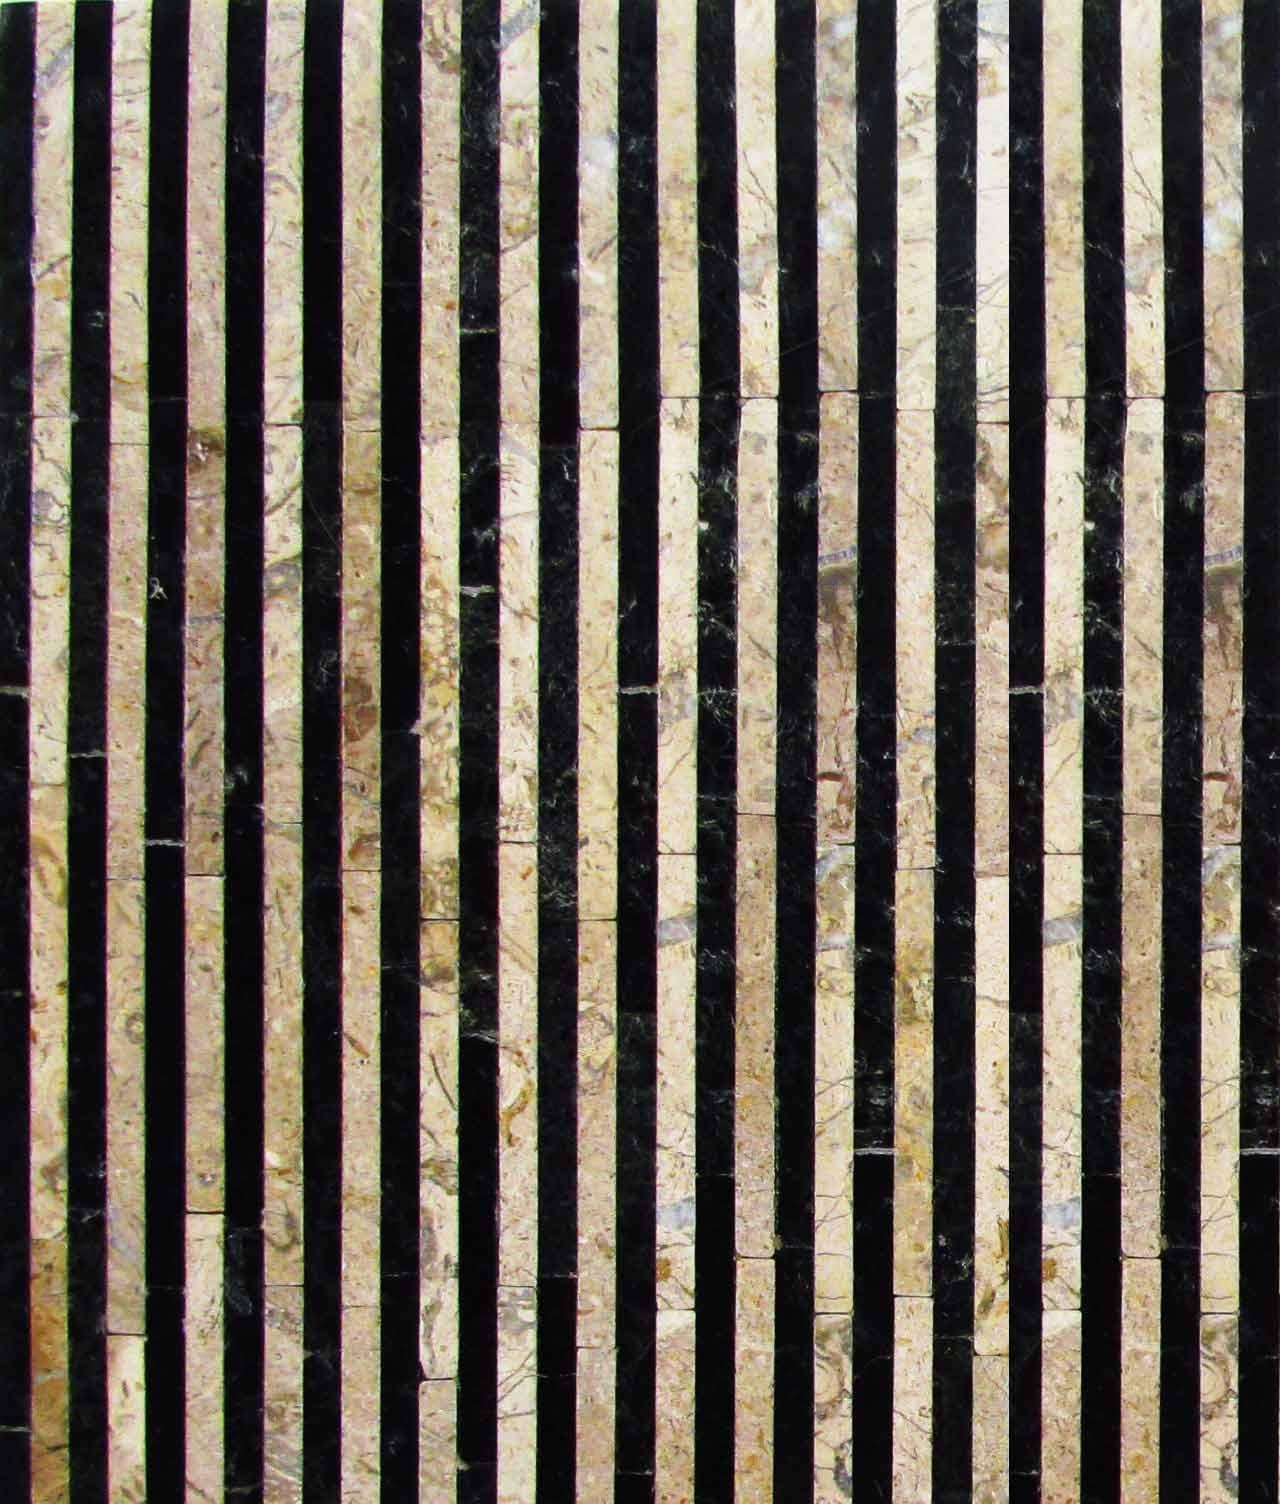 Black and White Stone Stripe Pattern